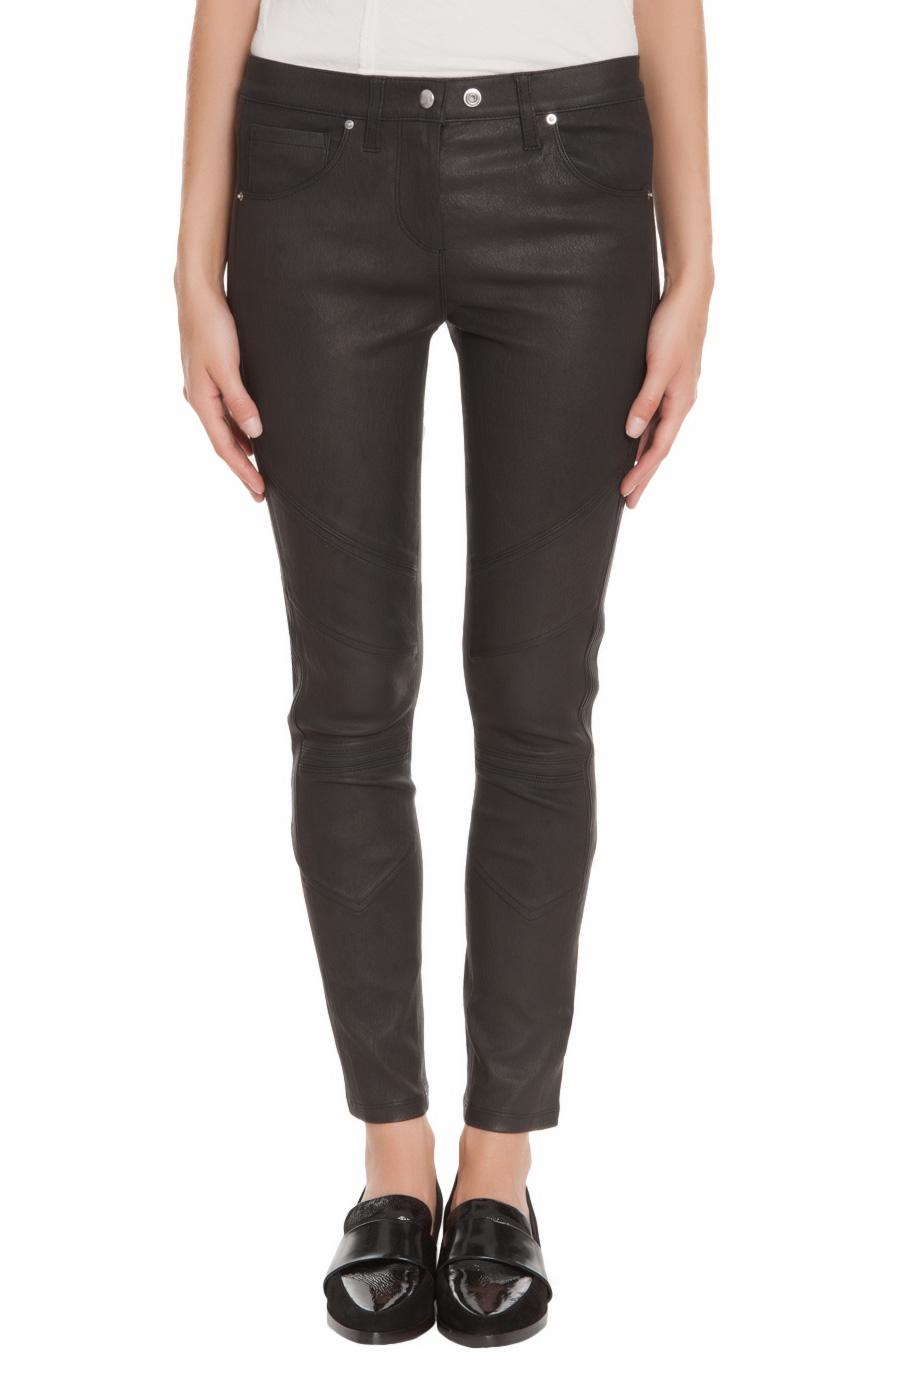 Black jelena leather skinny pant